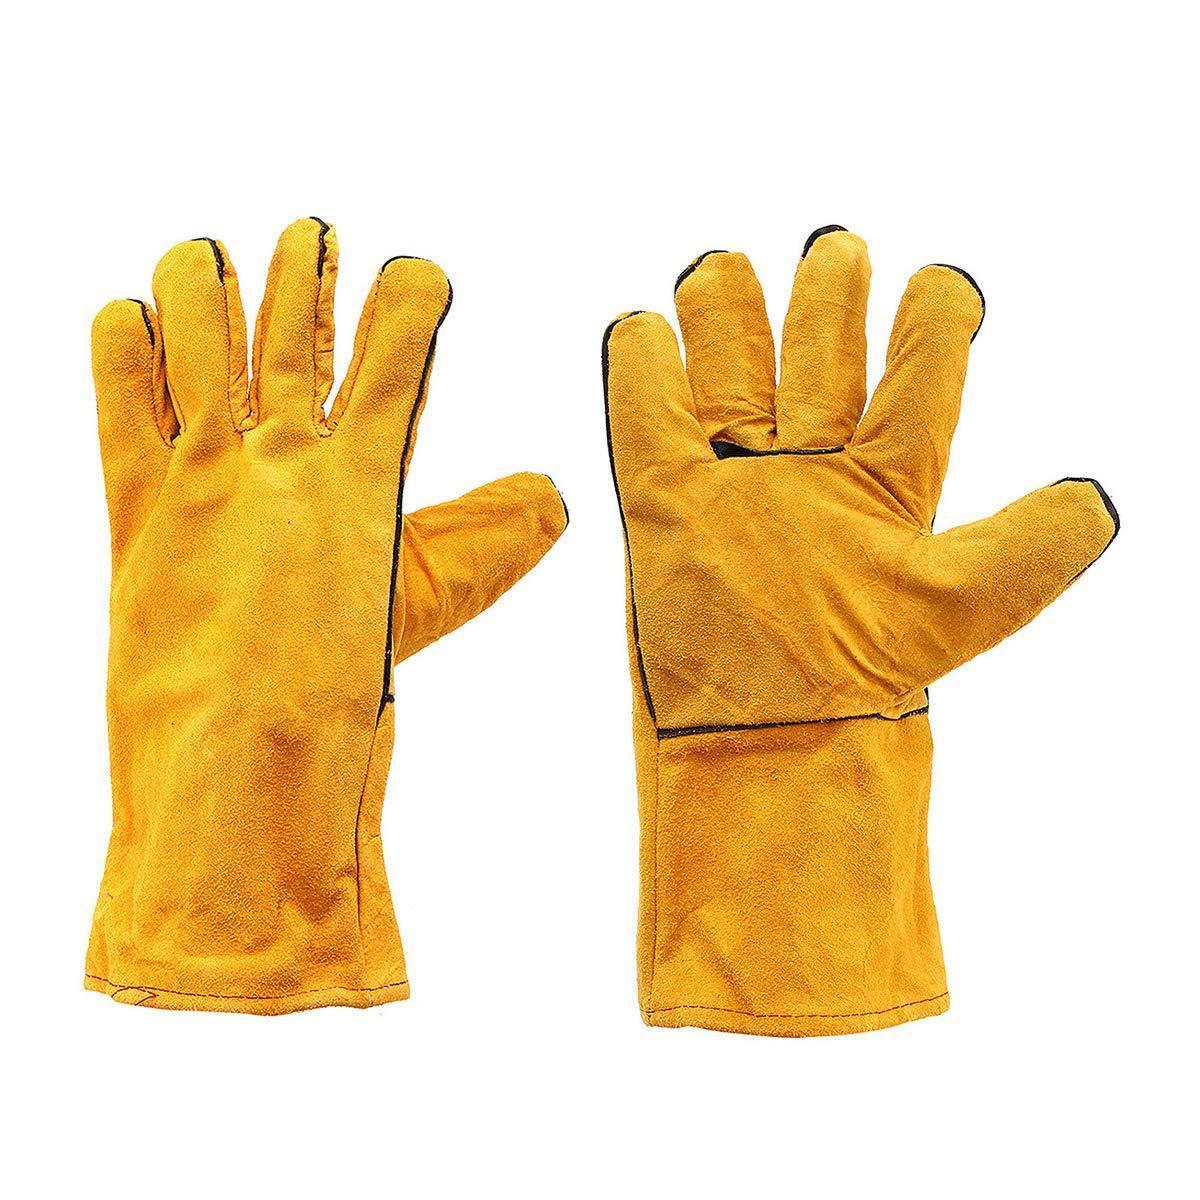 Protective Durable Heat Resistant Welding Gloves - Unnati Enterprises